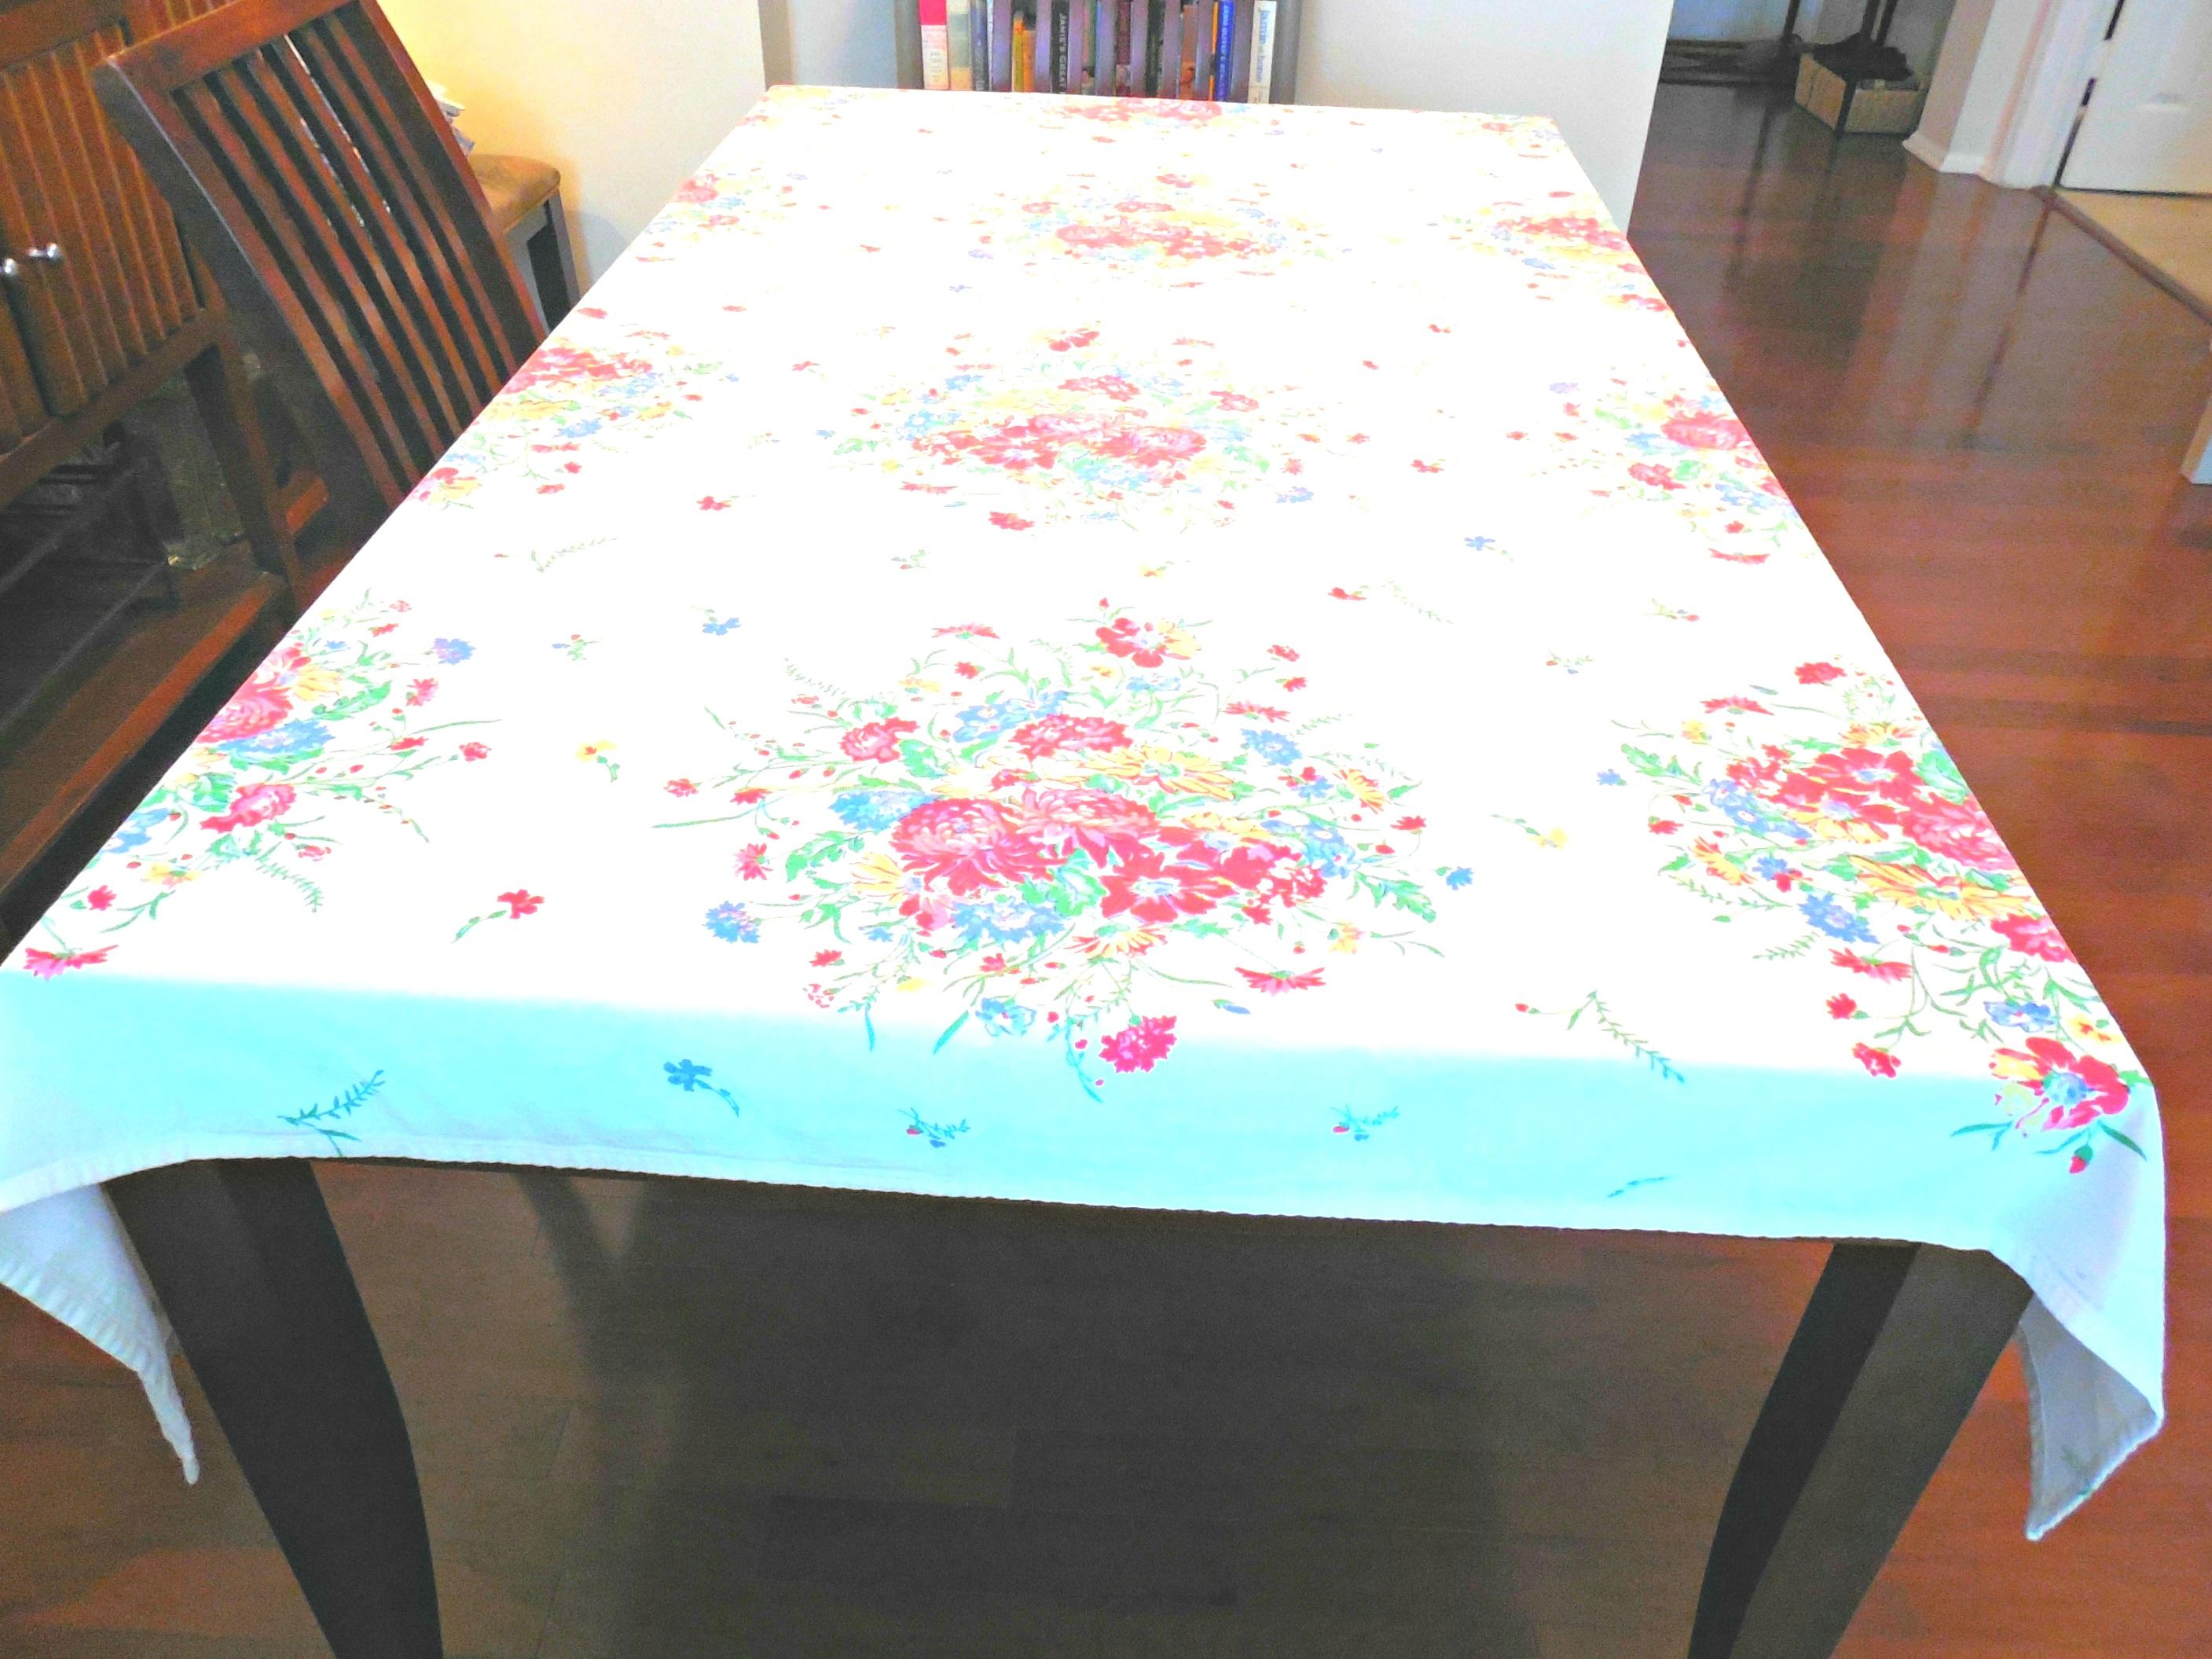 xochi table linens | Vintage Xochi tablecloth On Etsy BeautyFromThePast | Vintage ..